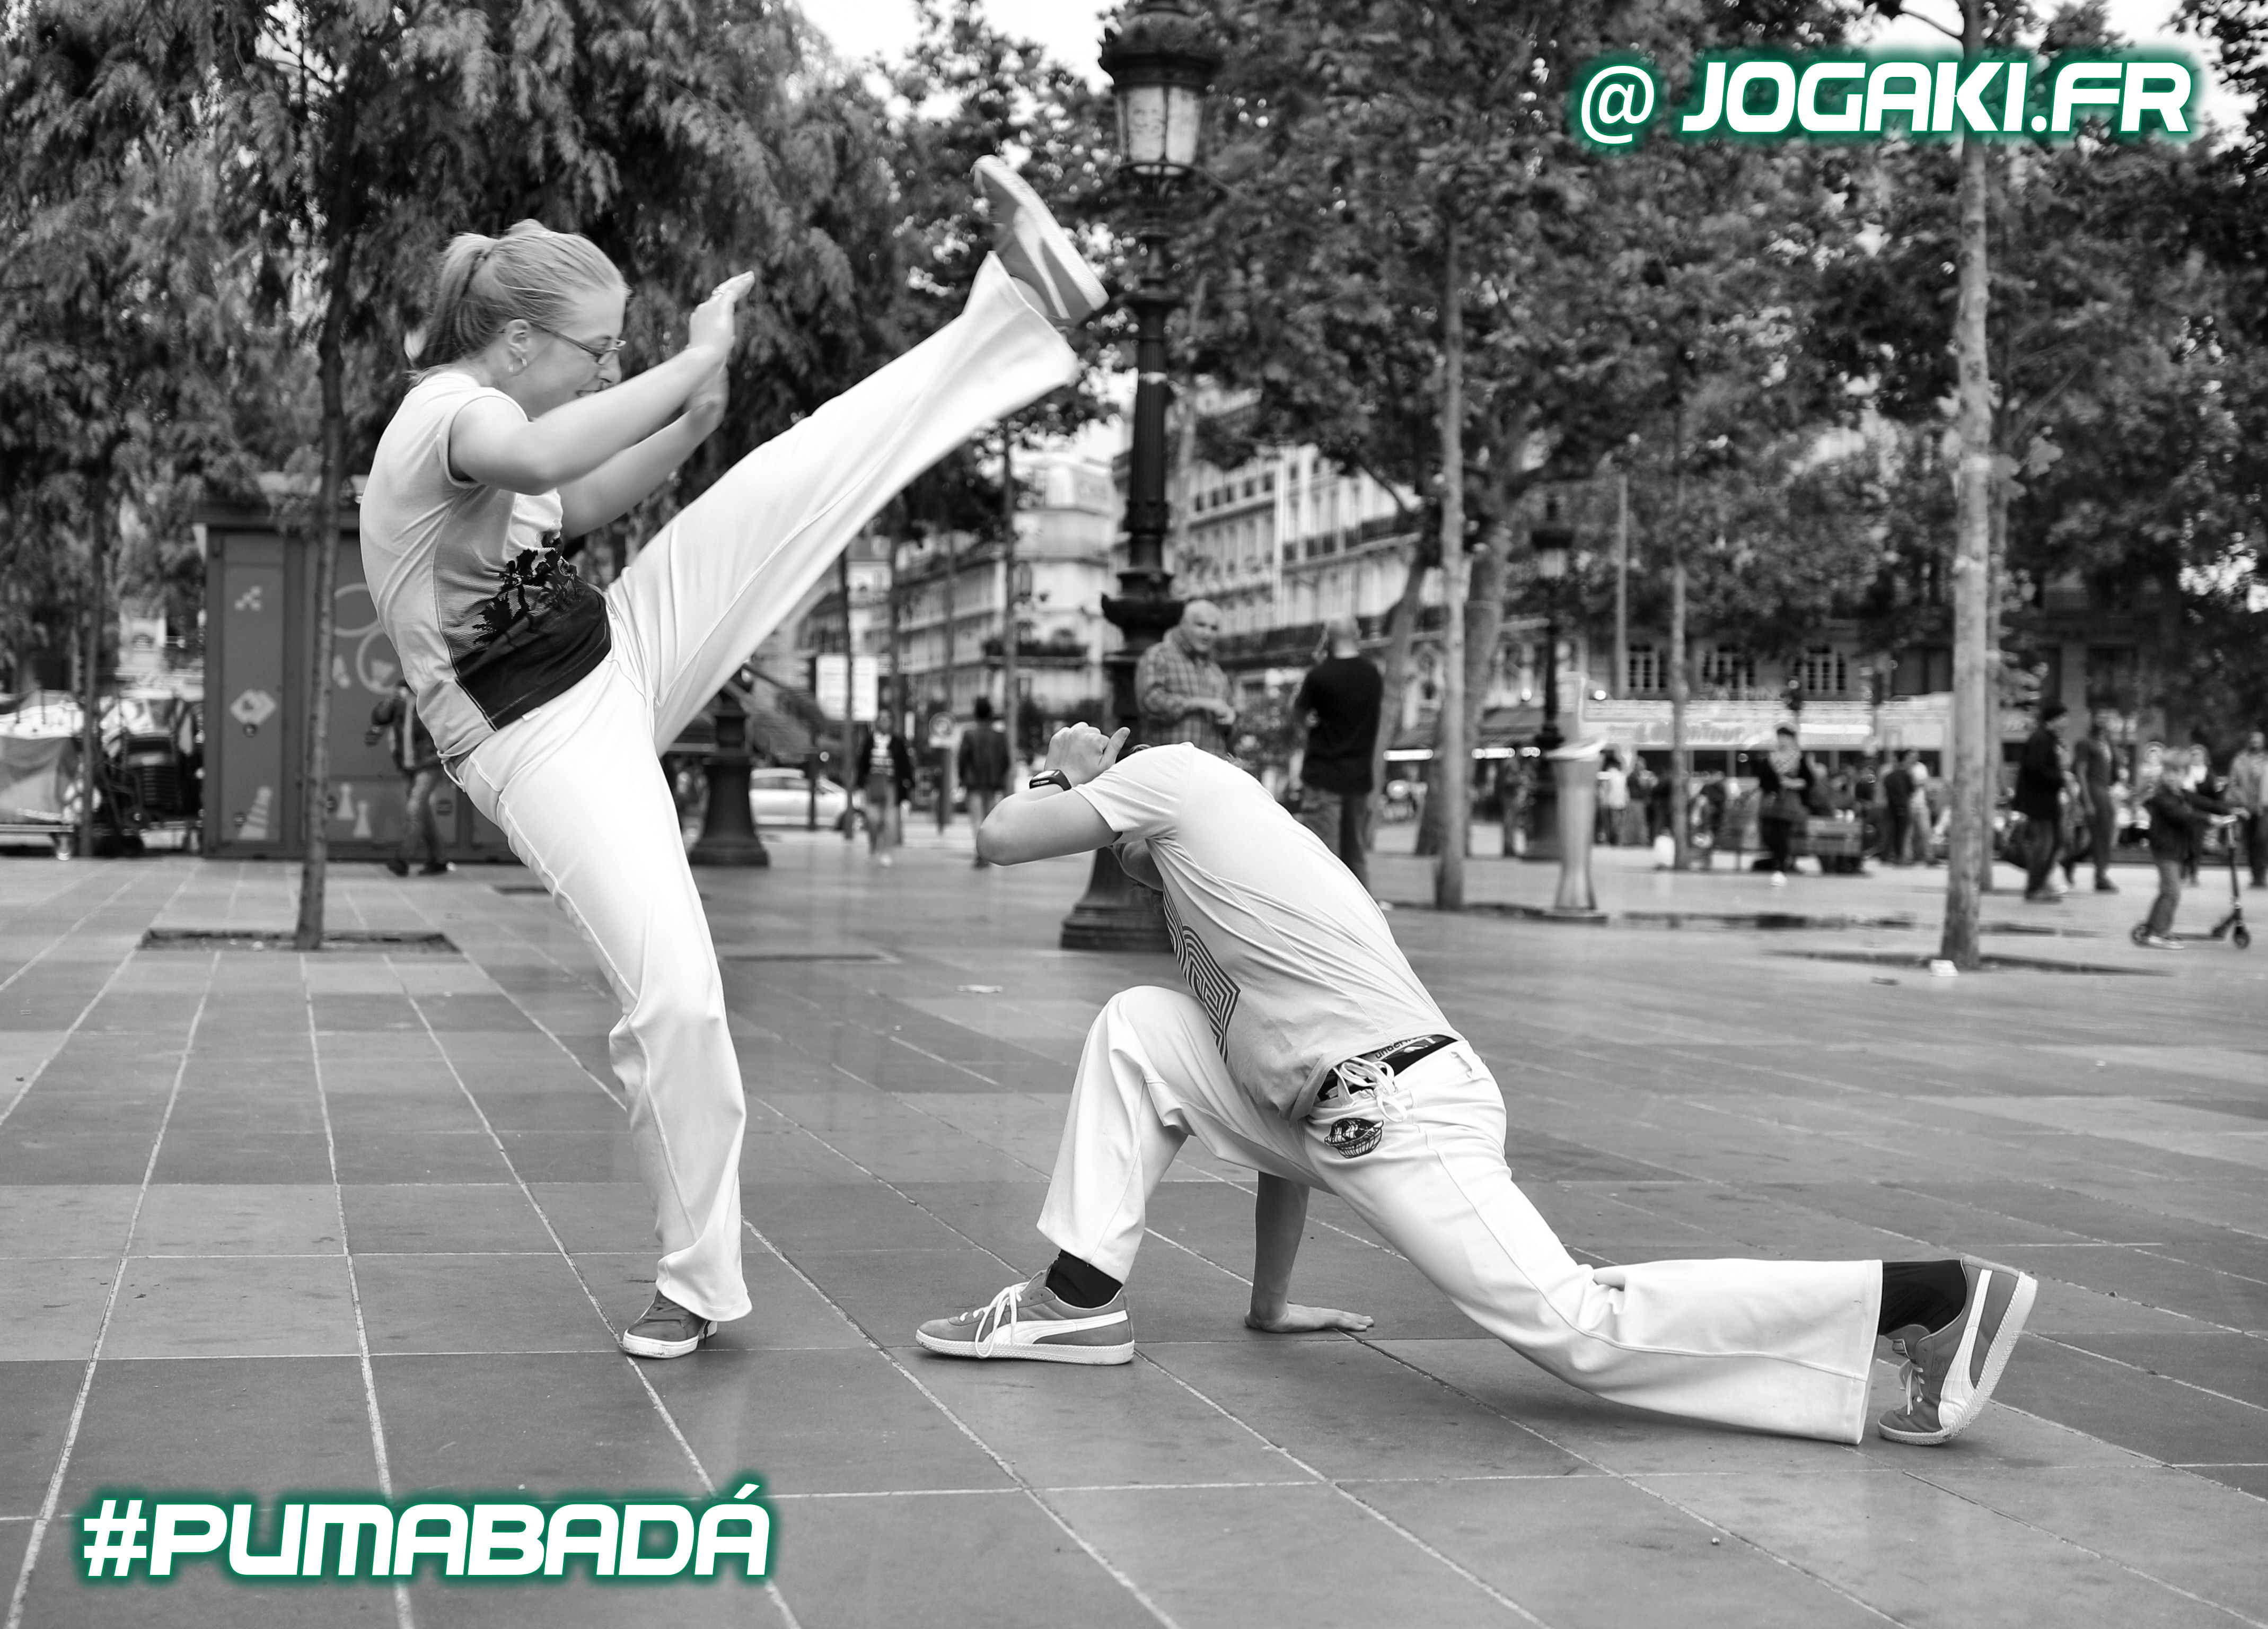 capoeira-paris-pumabada-jogaki-animation-bresil-danse